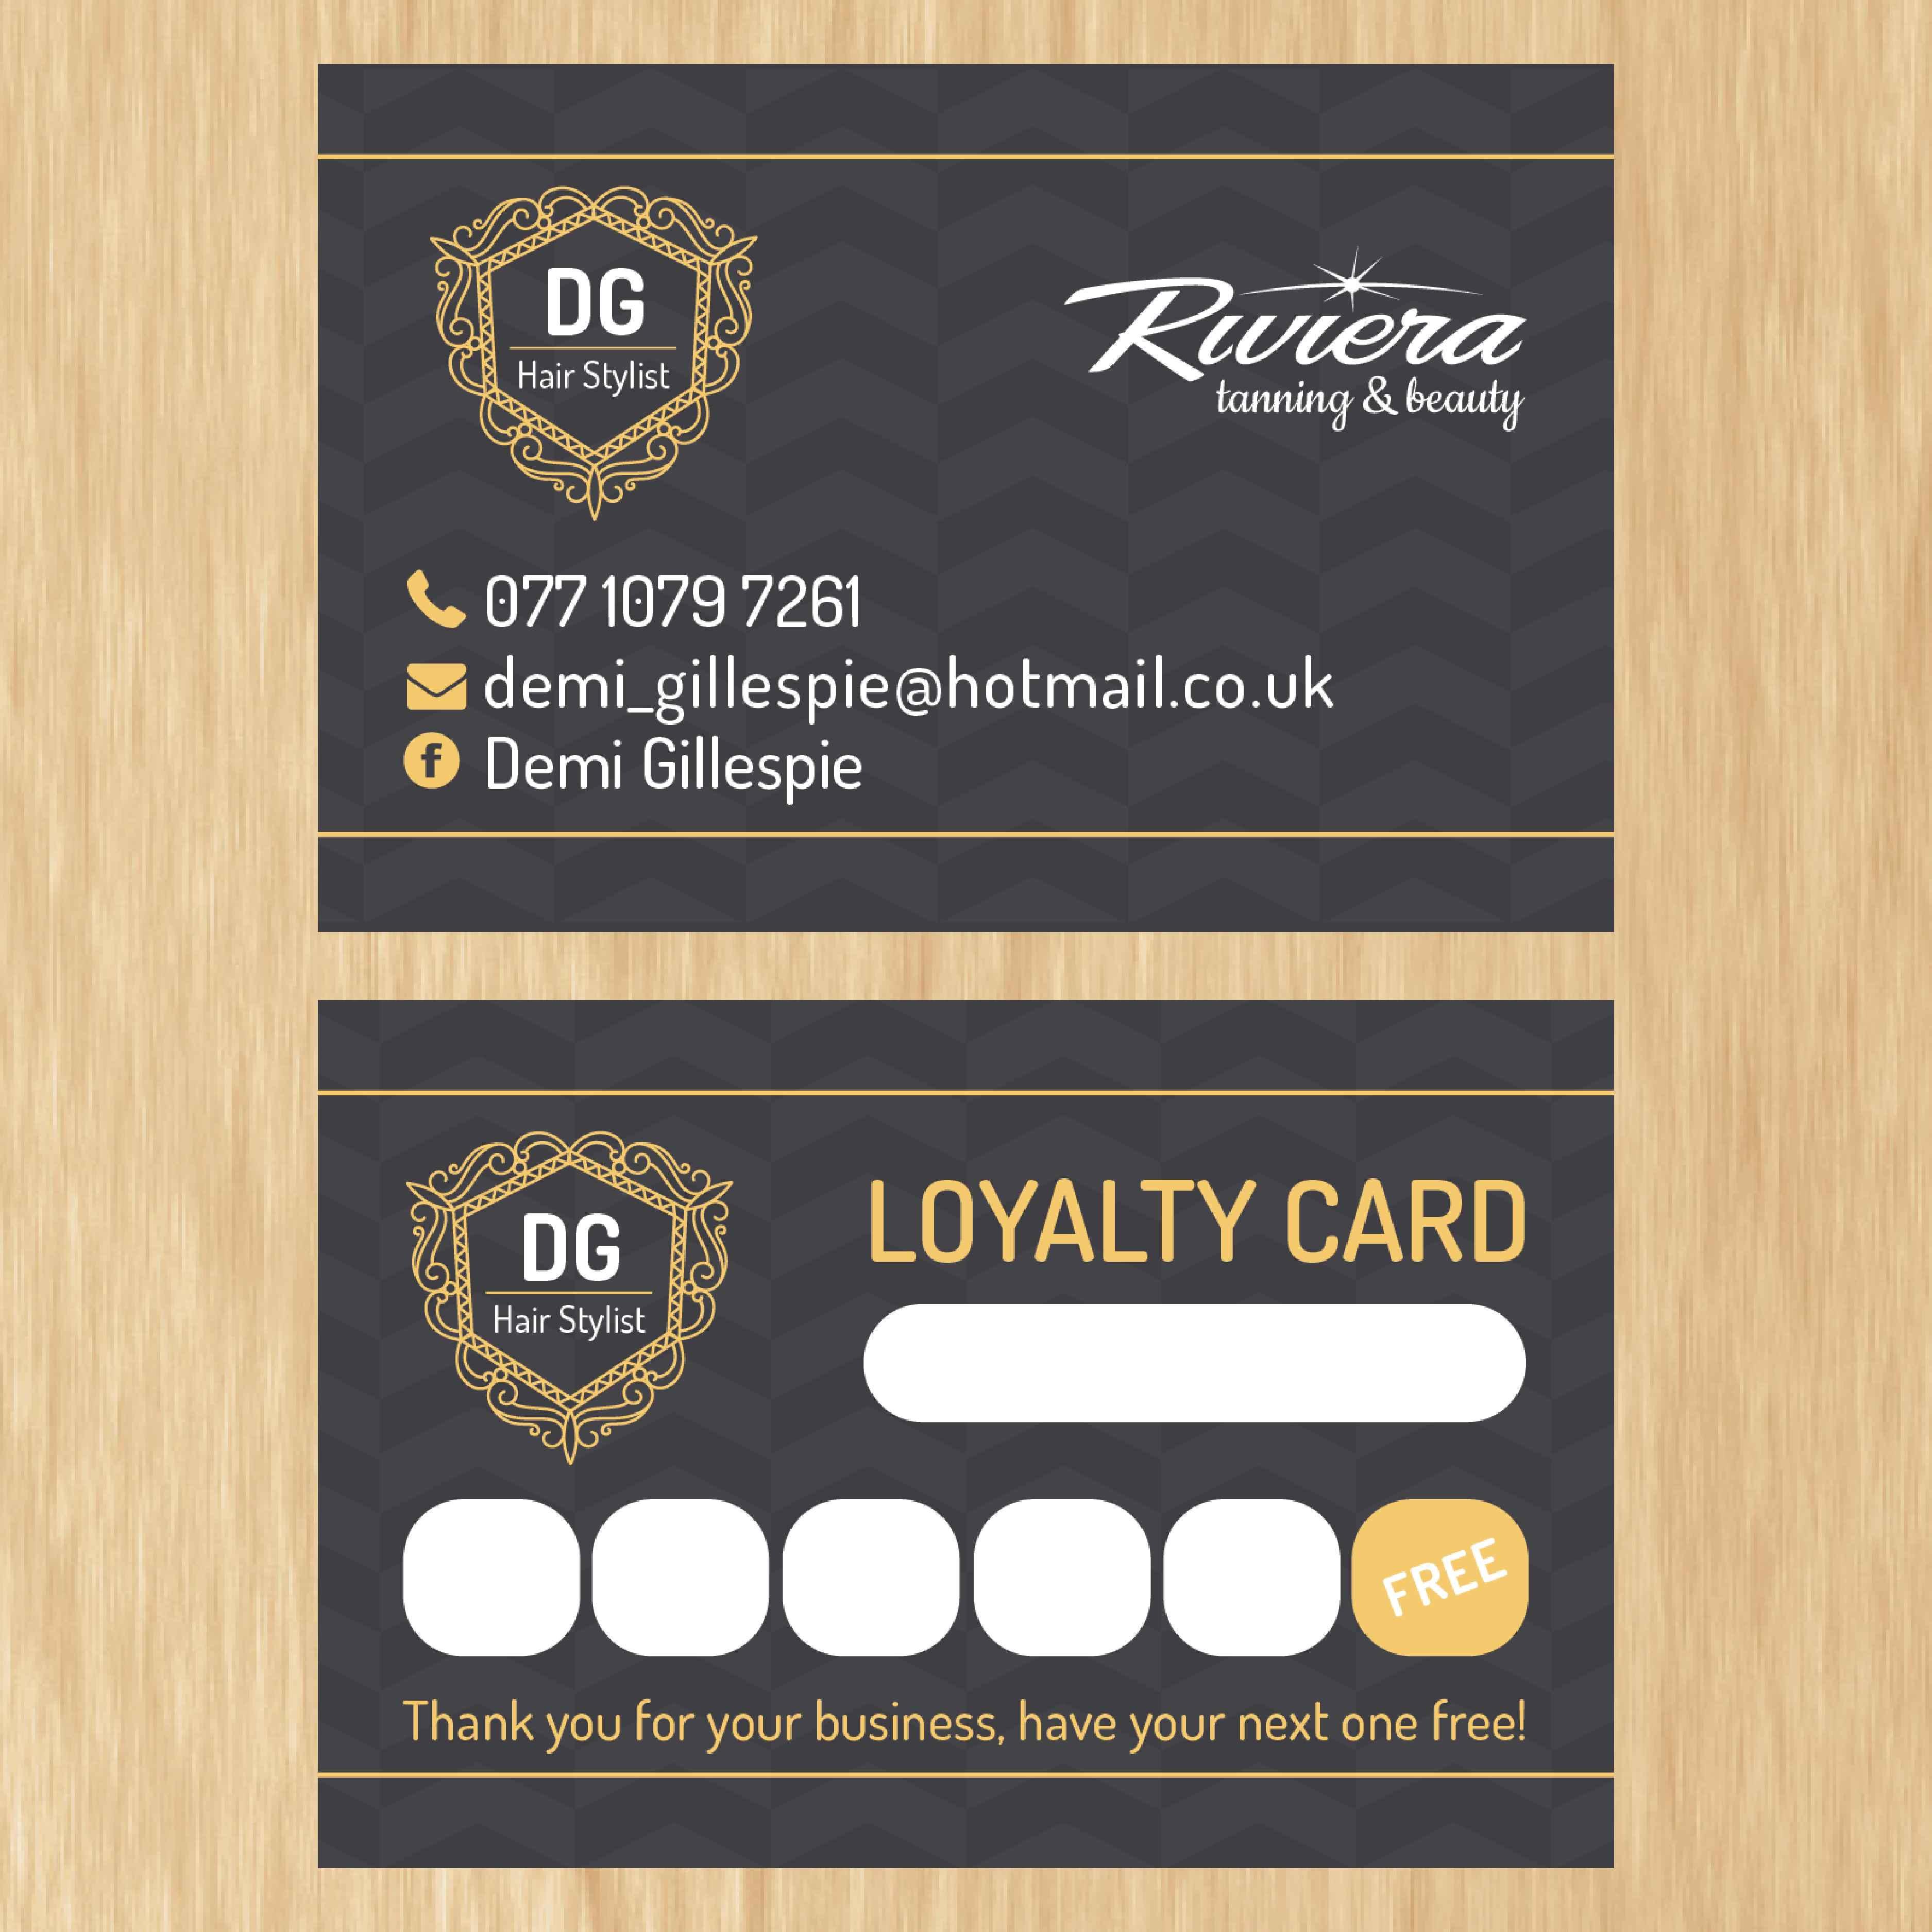 Loyalty-Cards-06 – Web Design, Graphic Design, Logo Design Derry ...